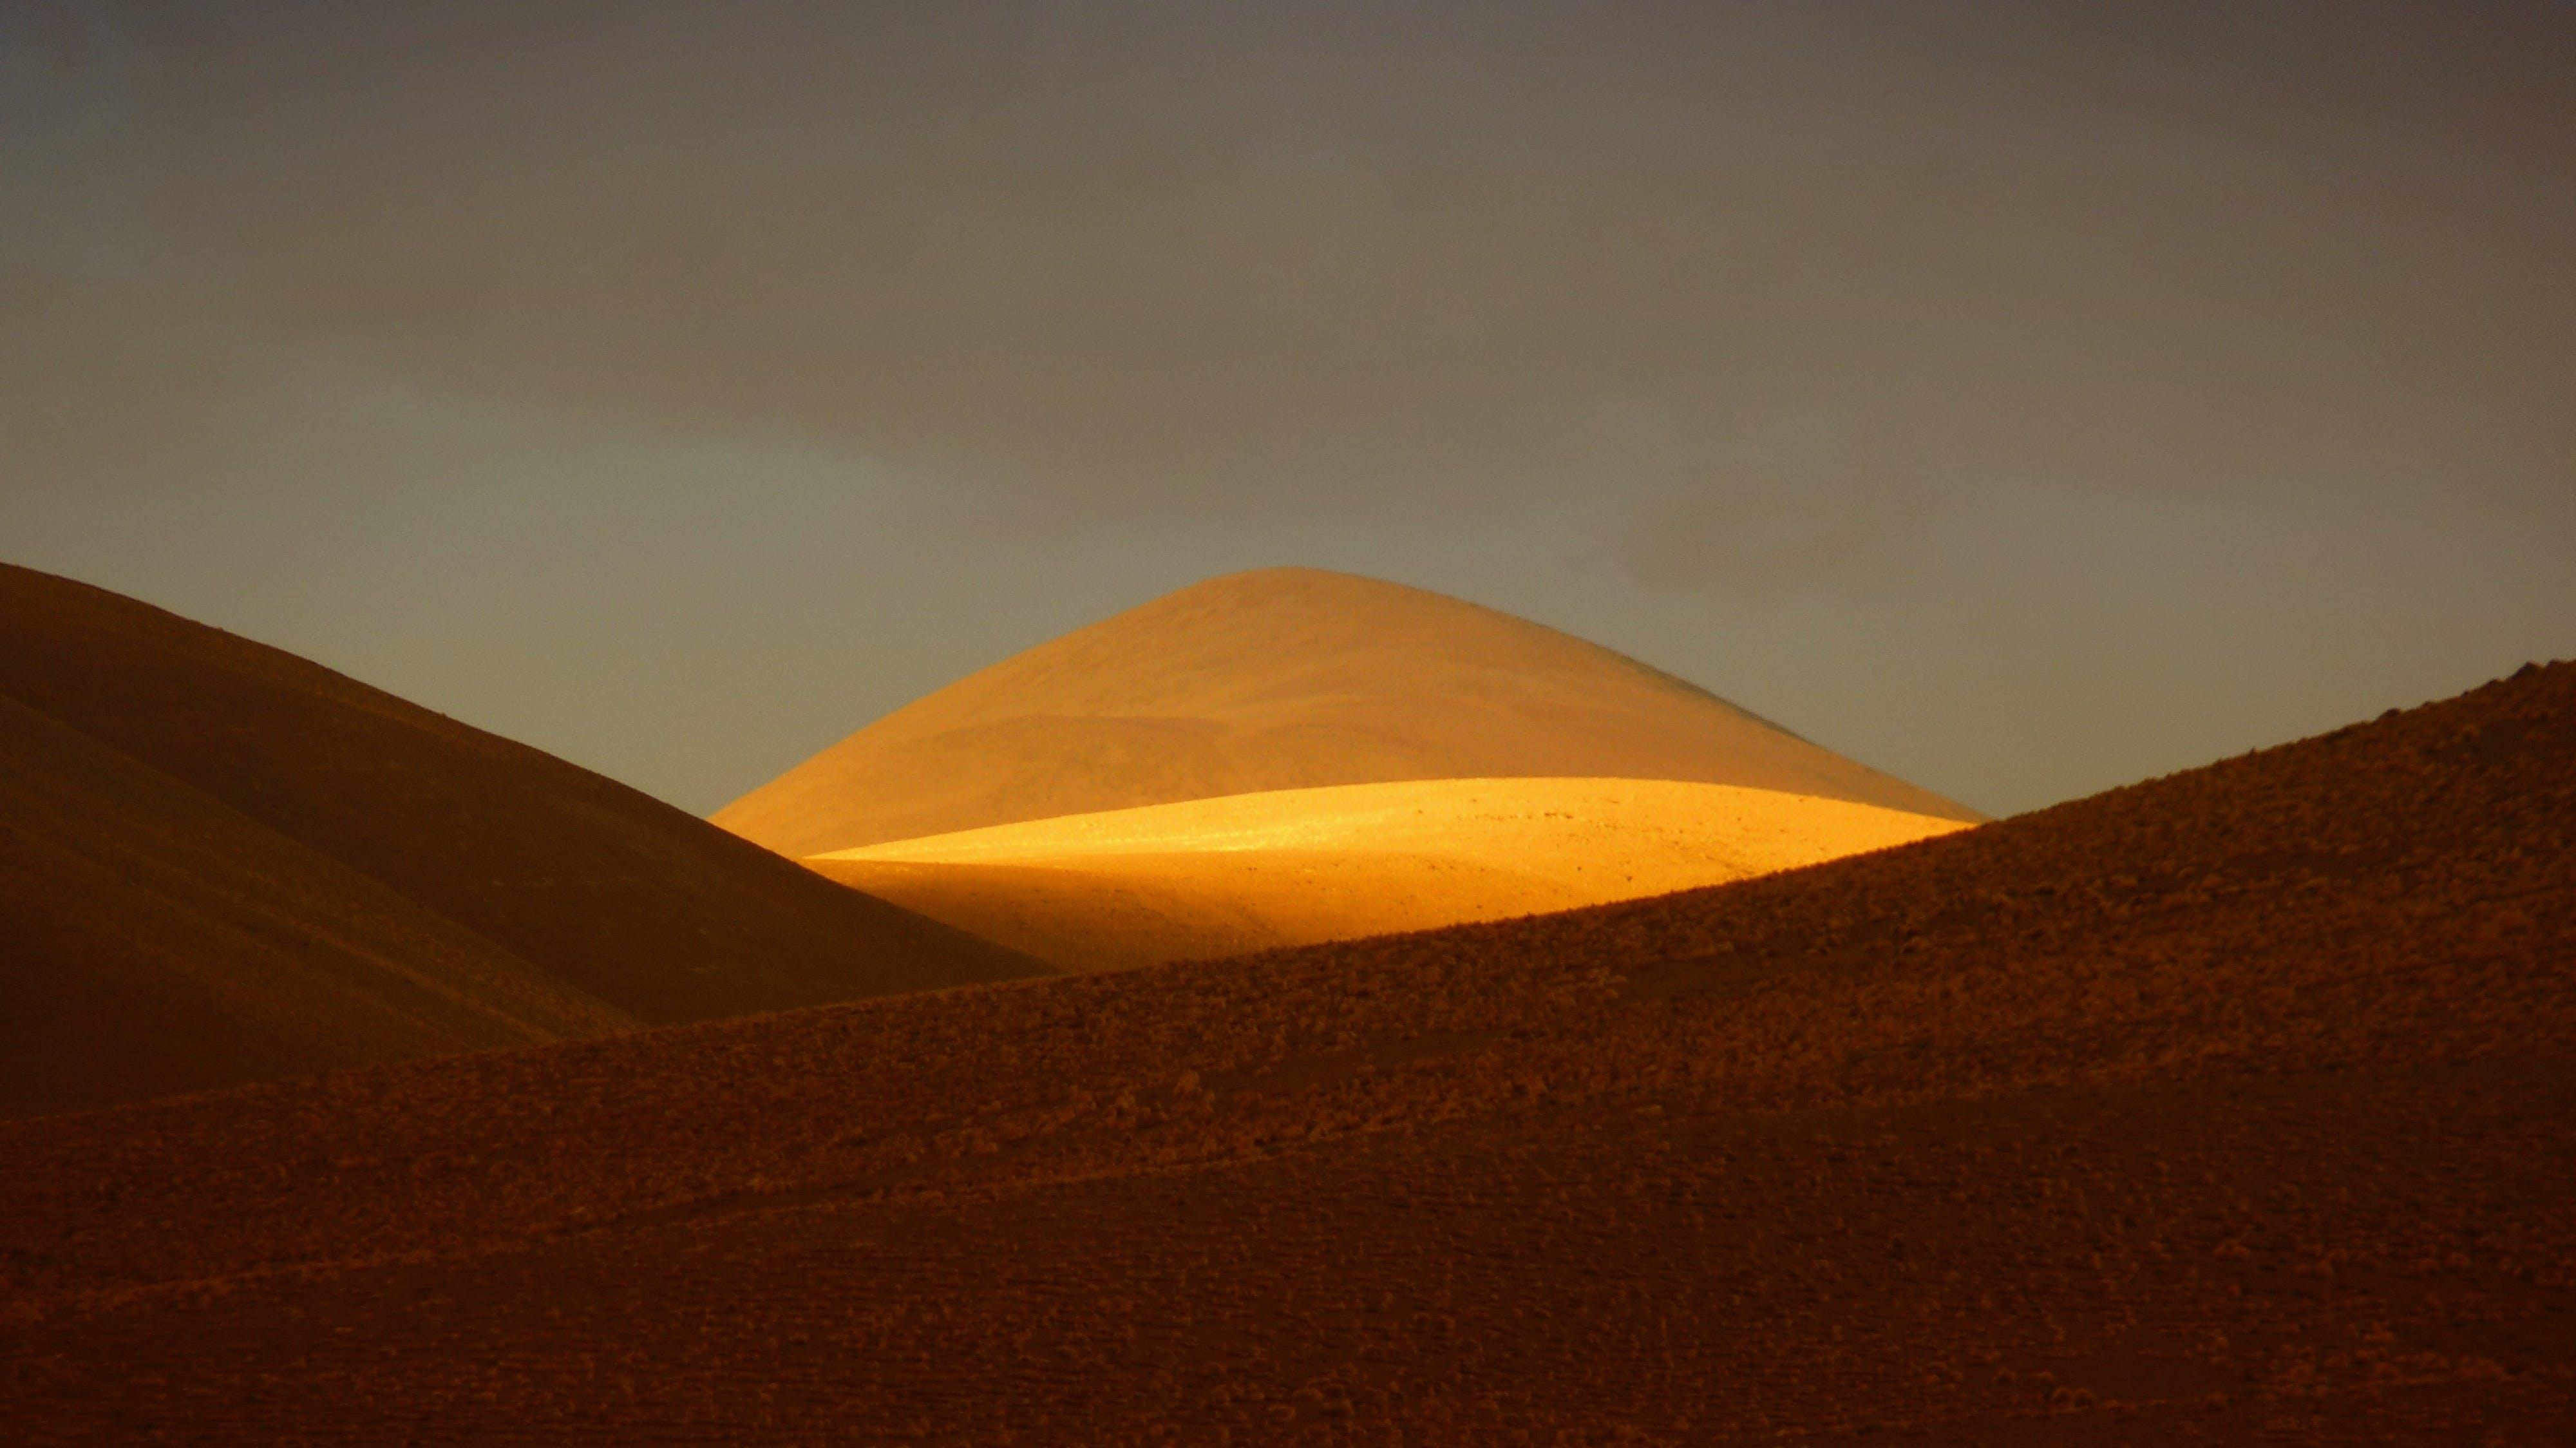 Orange and Red Desert